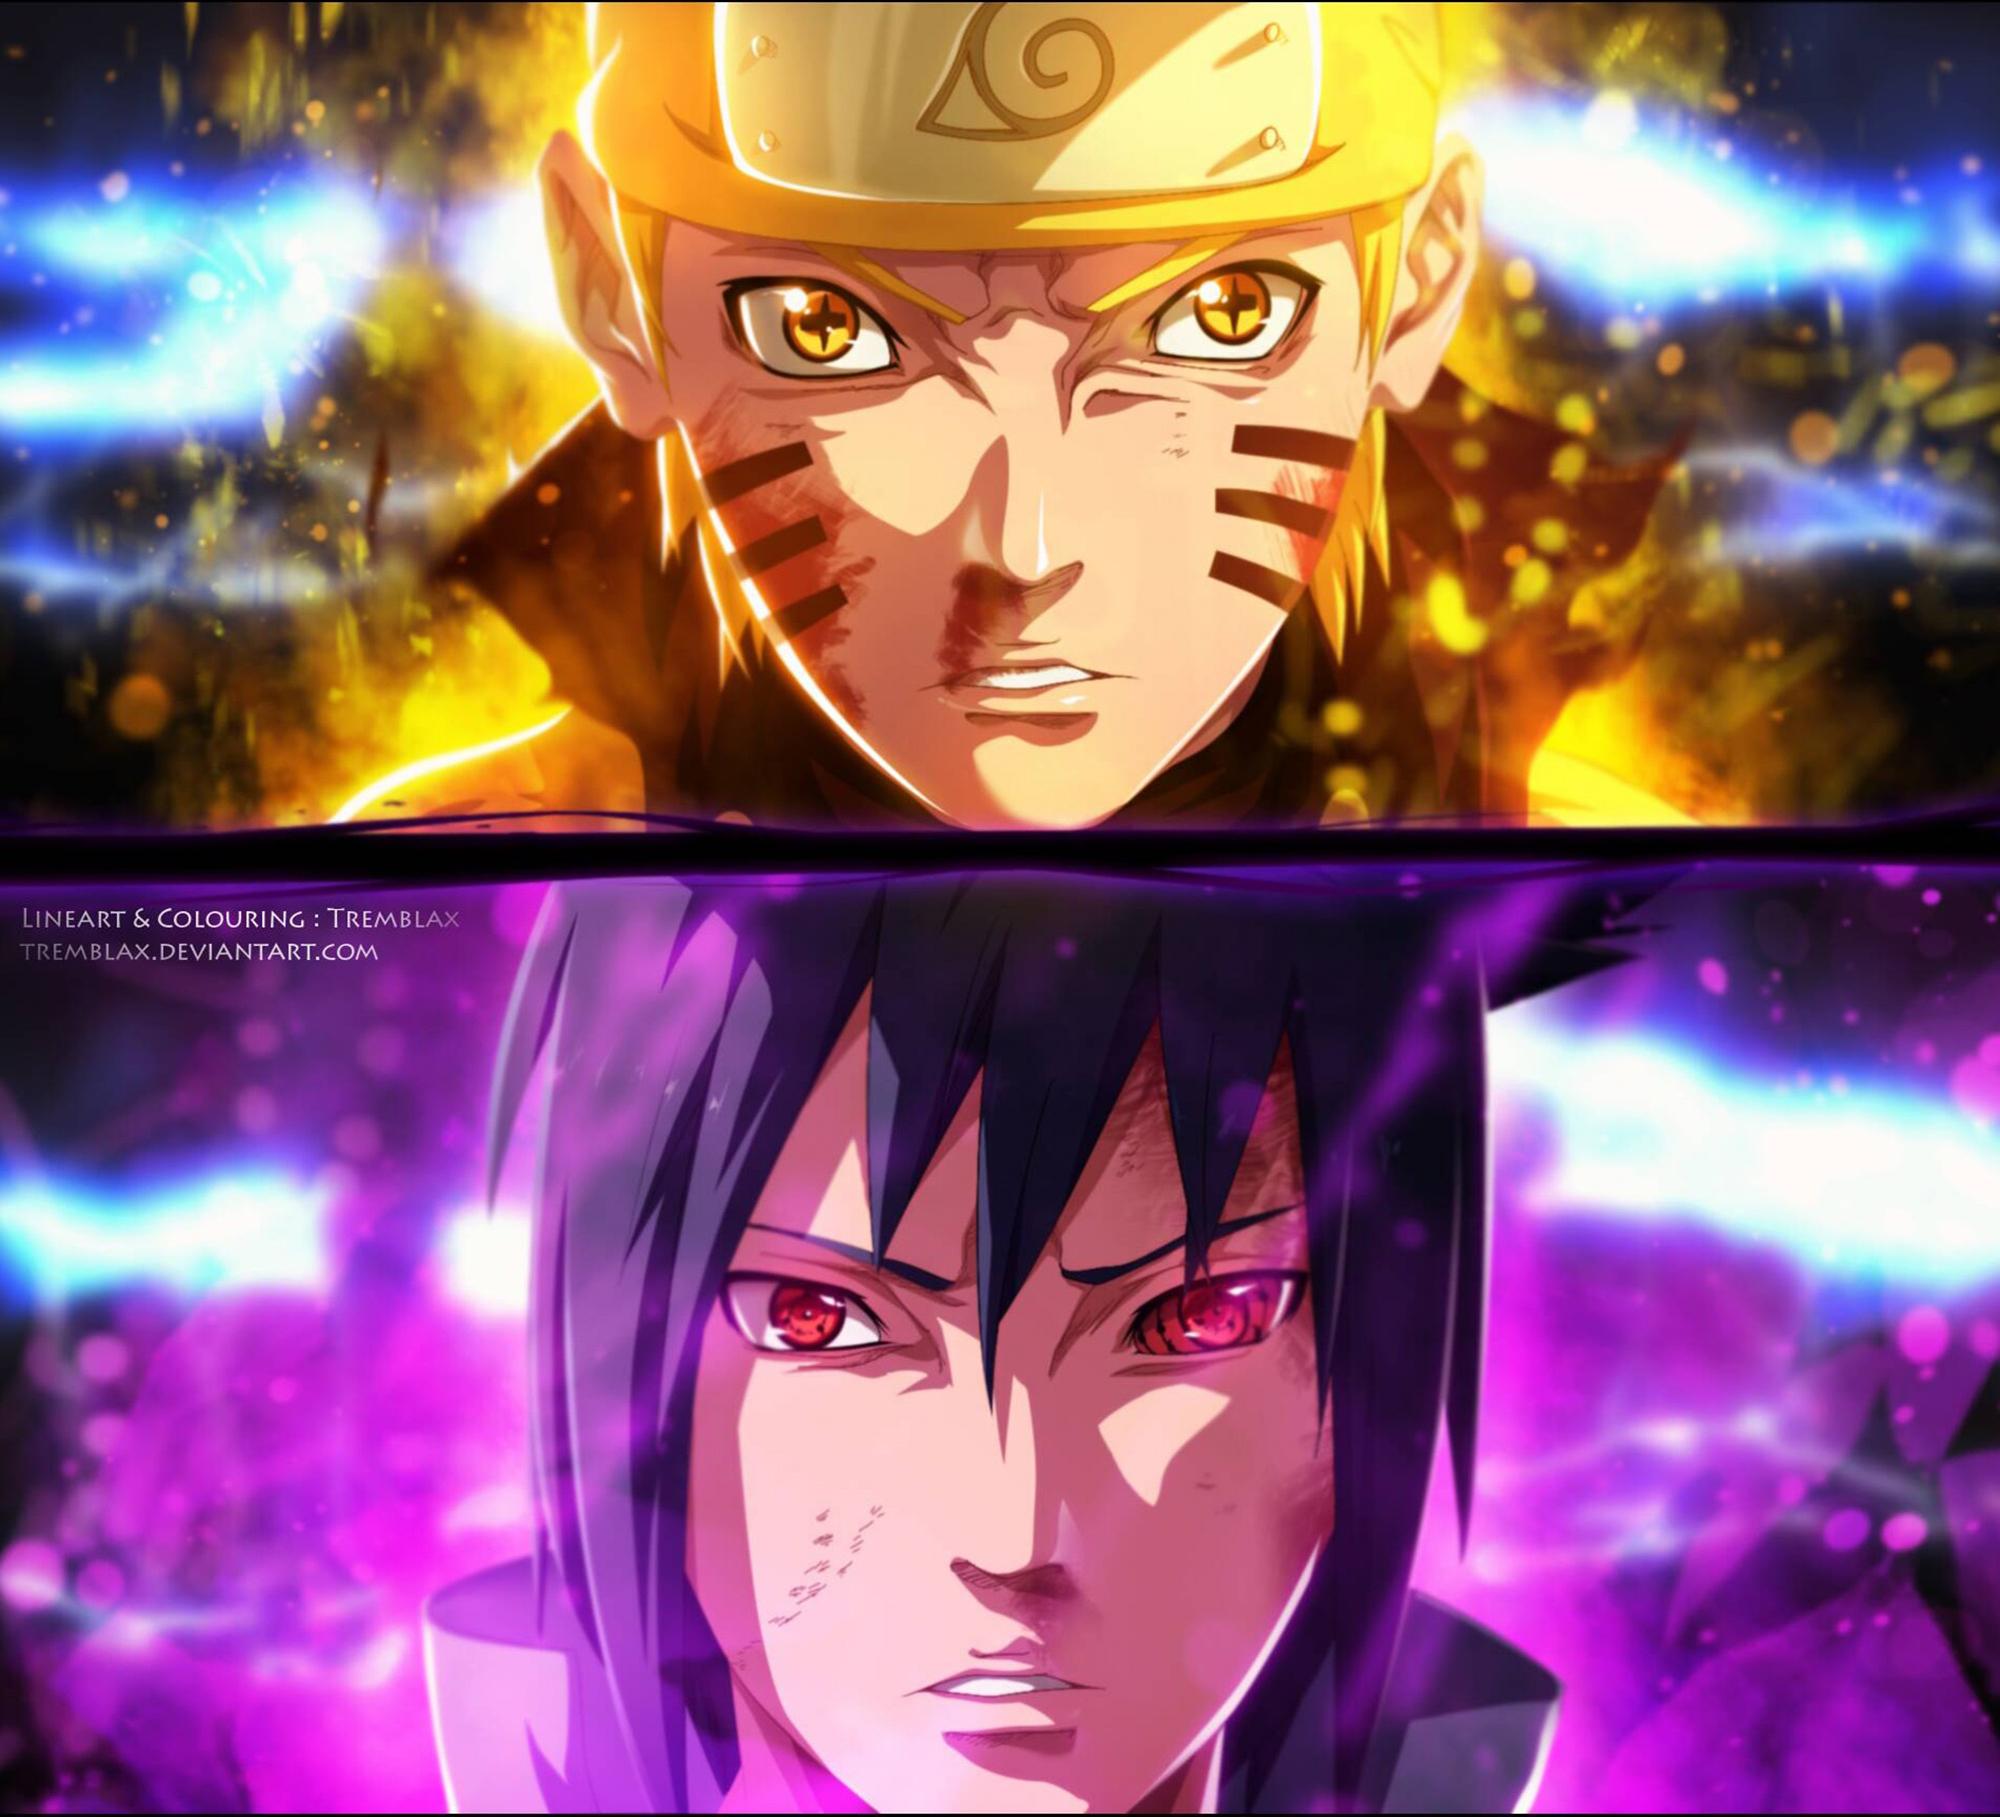 Naruto and Sasuke Full HD Wallpaper and Background Image | 2000x1817 | ID:654870